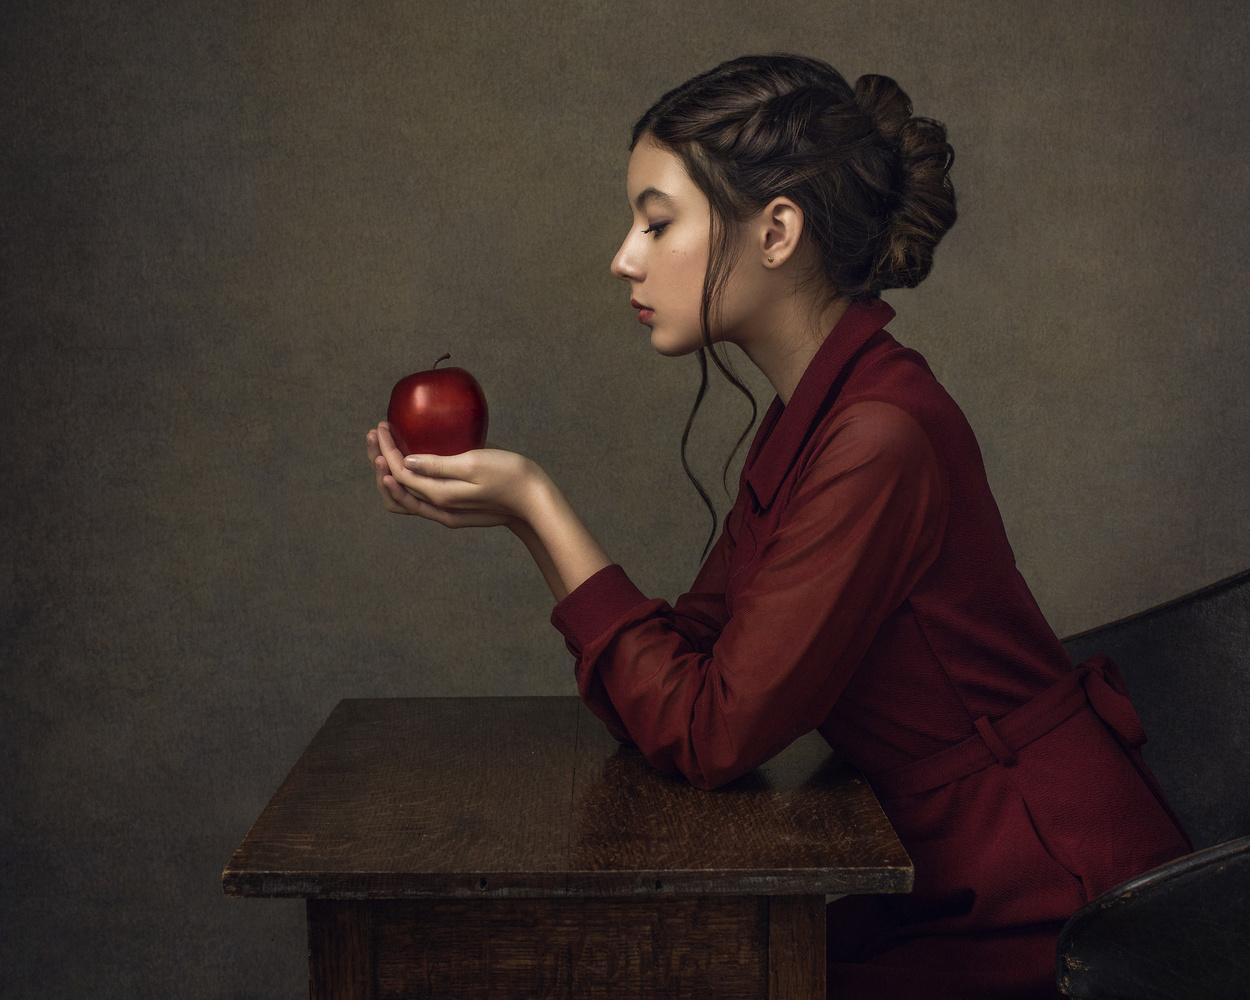 Forbidden Fruit by Barbara MacFerrin